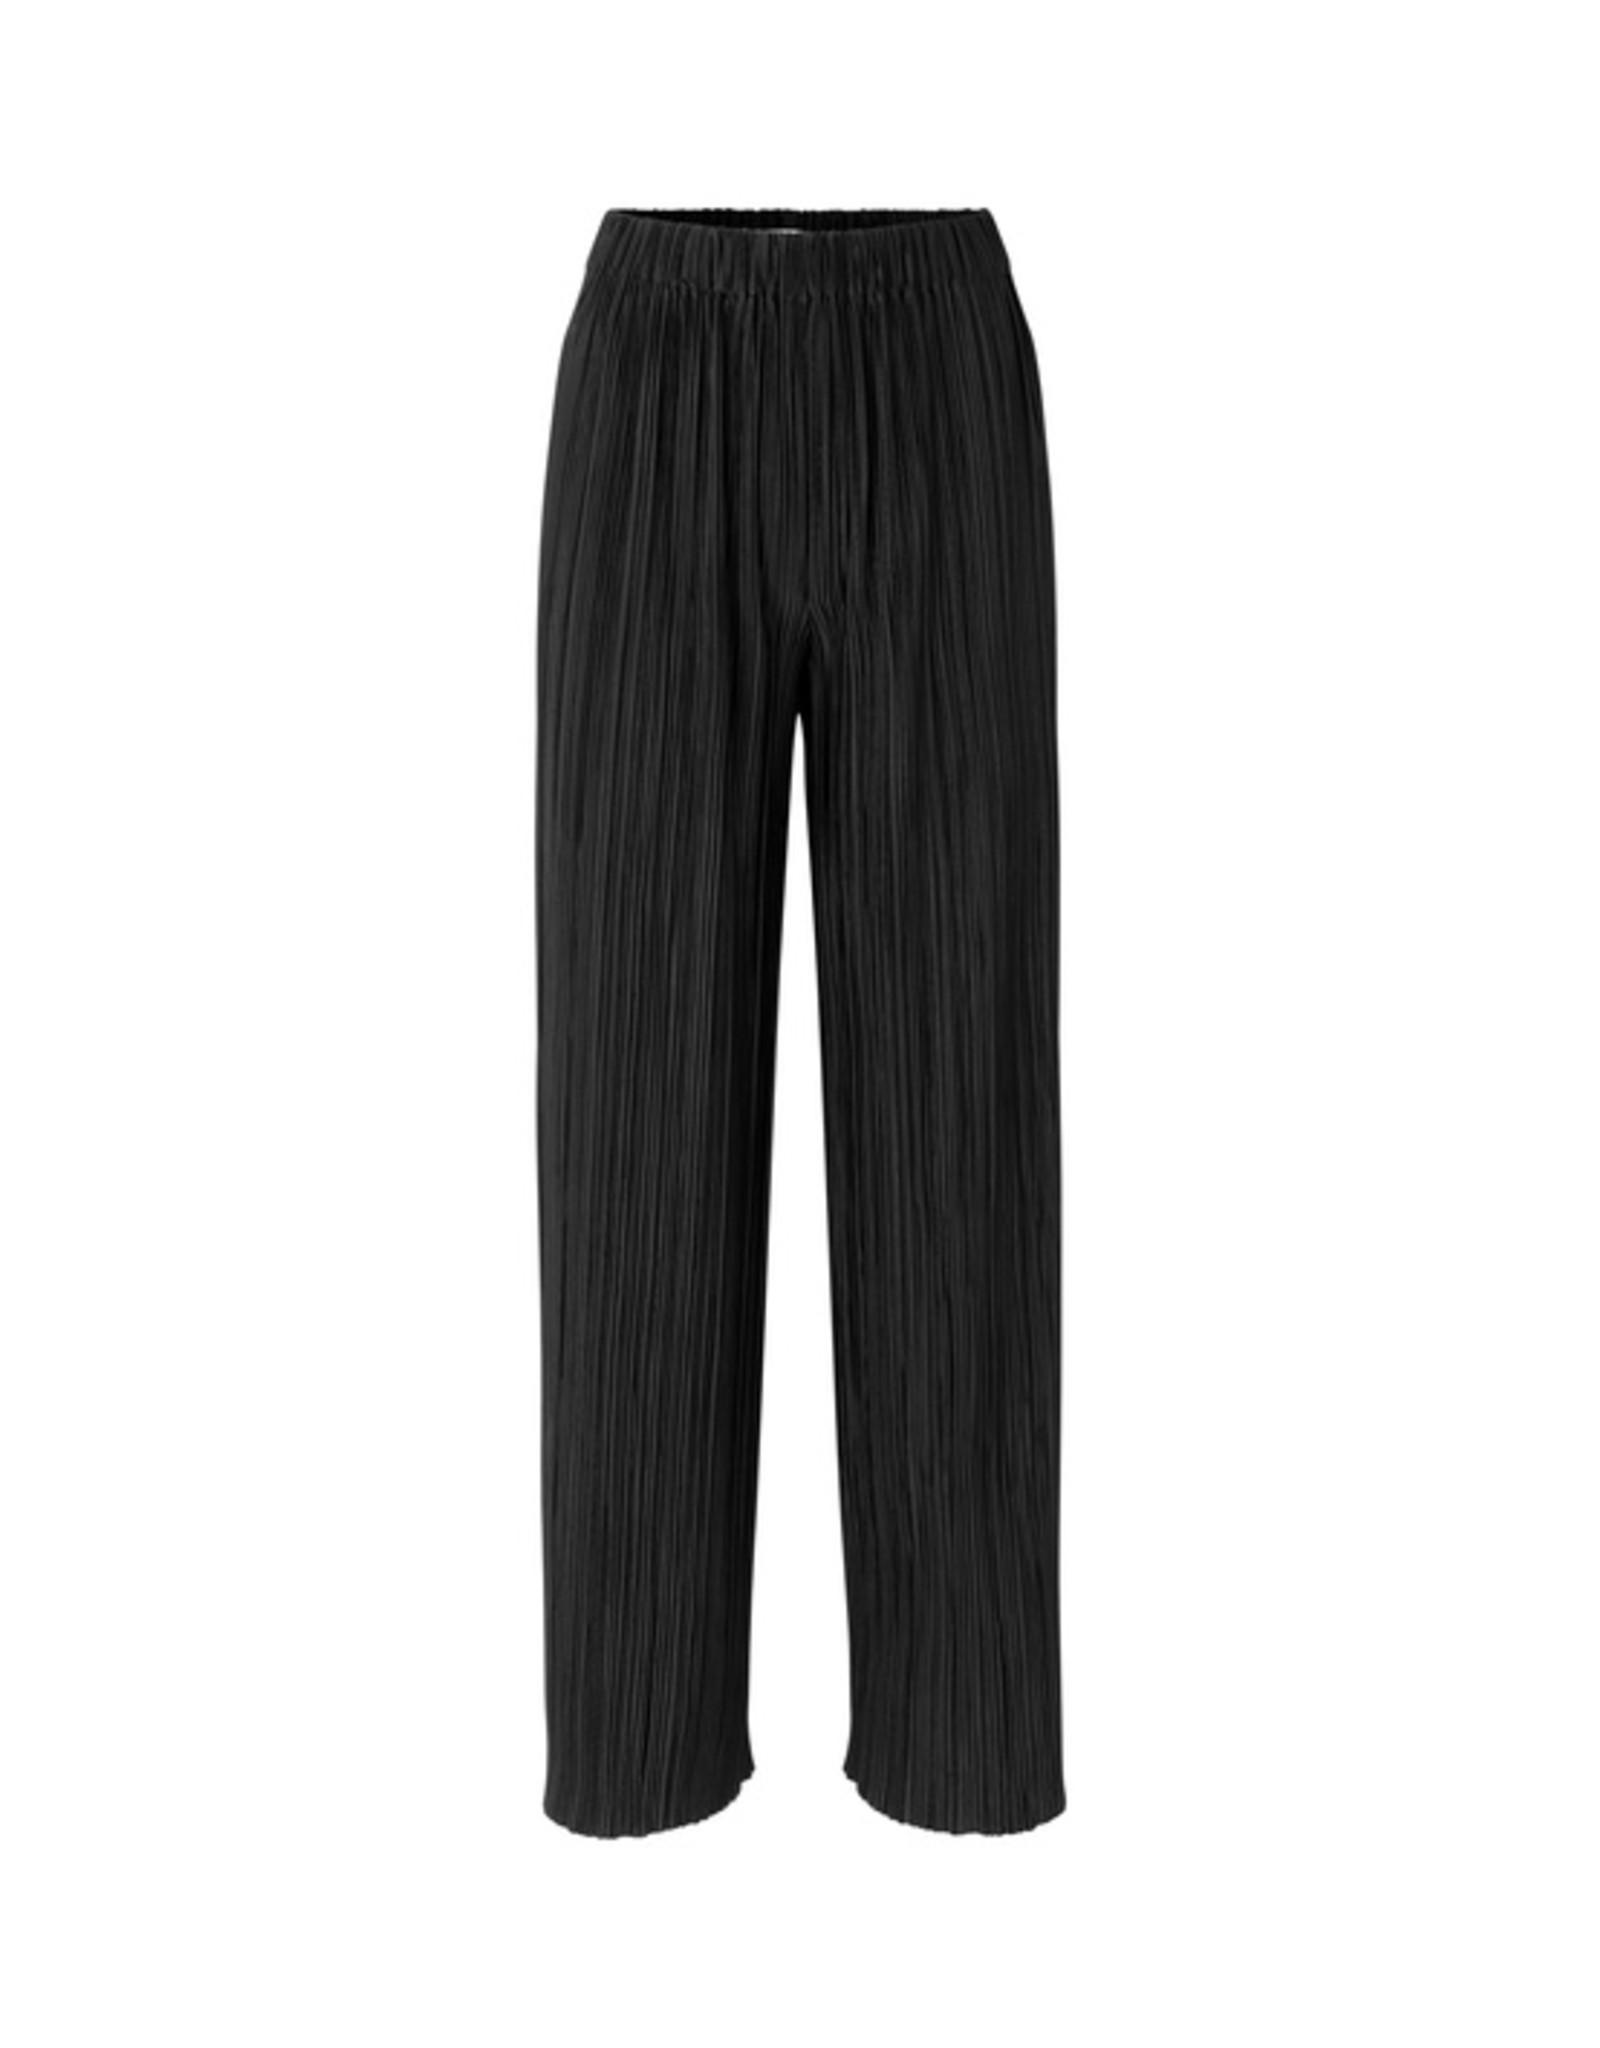 Samsoe & Samsoe Uma trousers BLACK